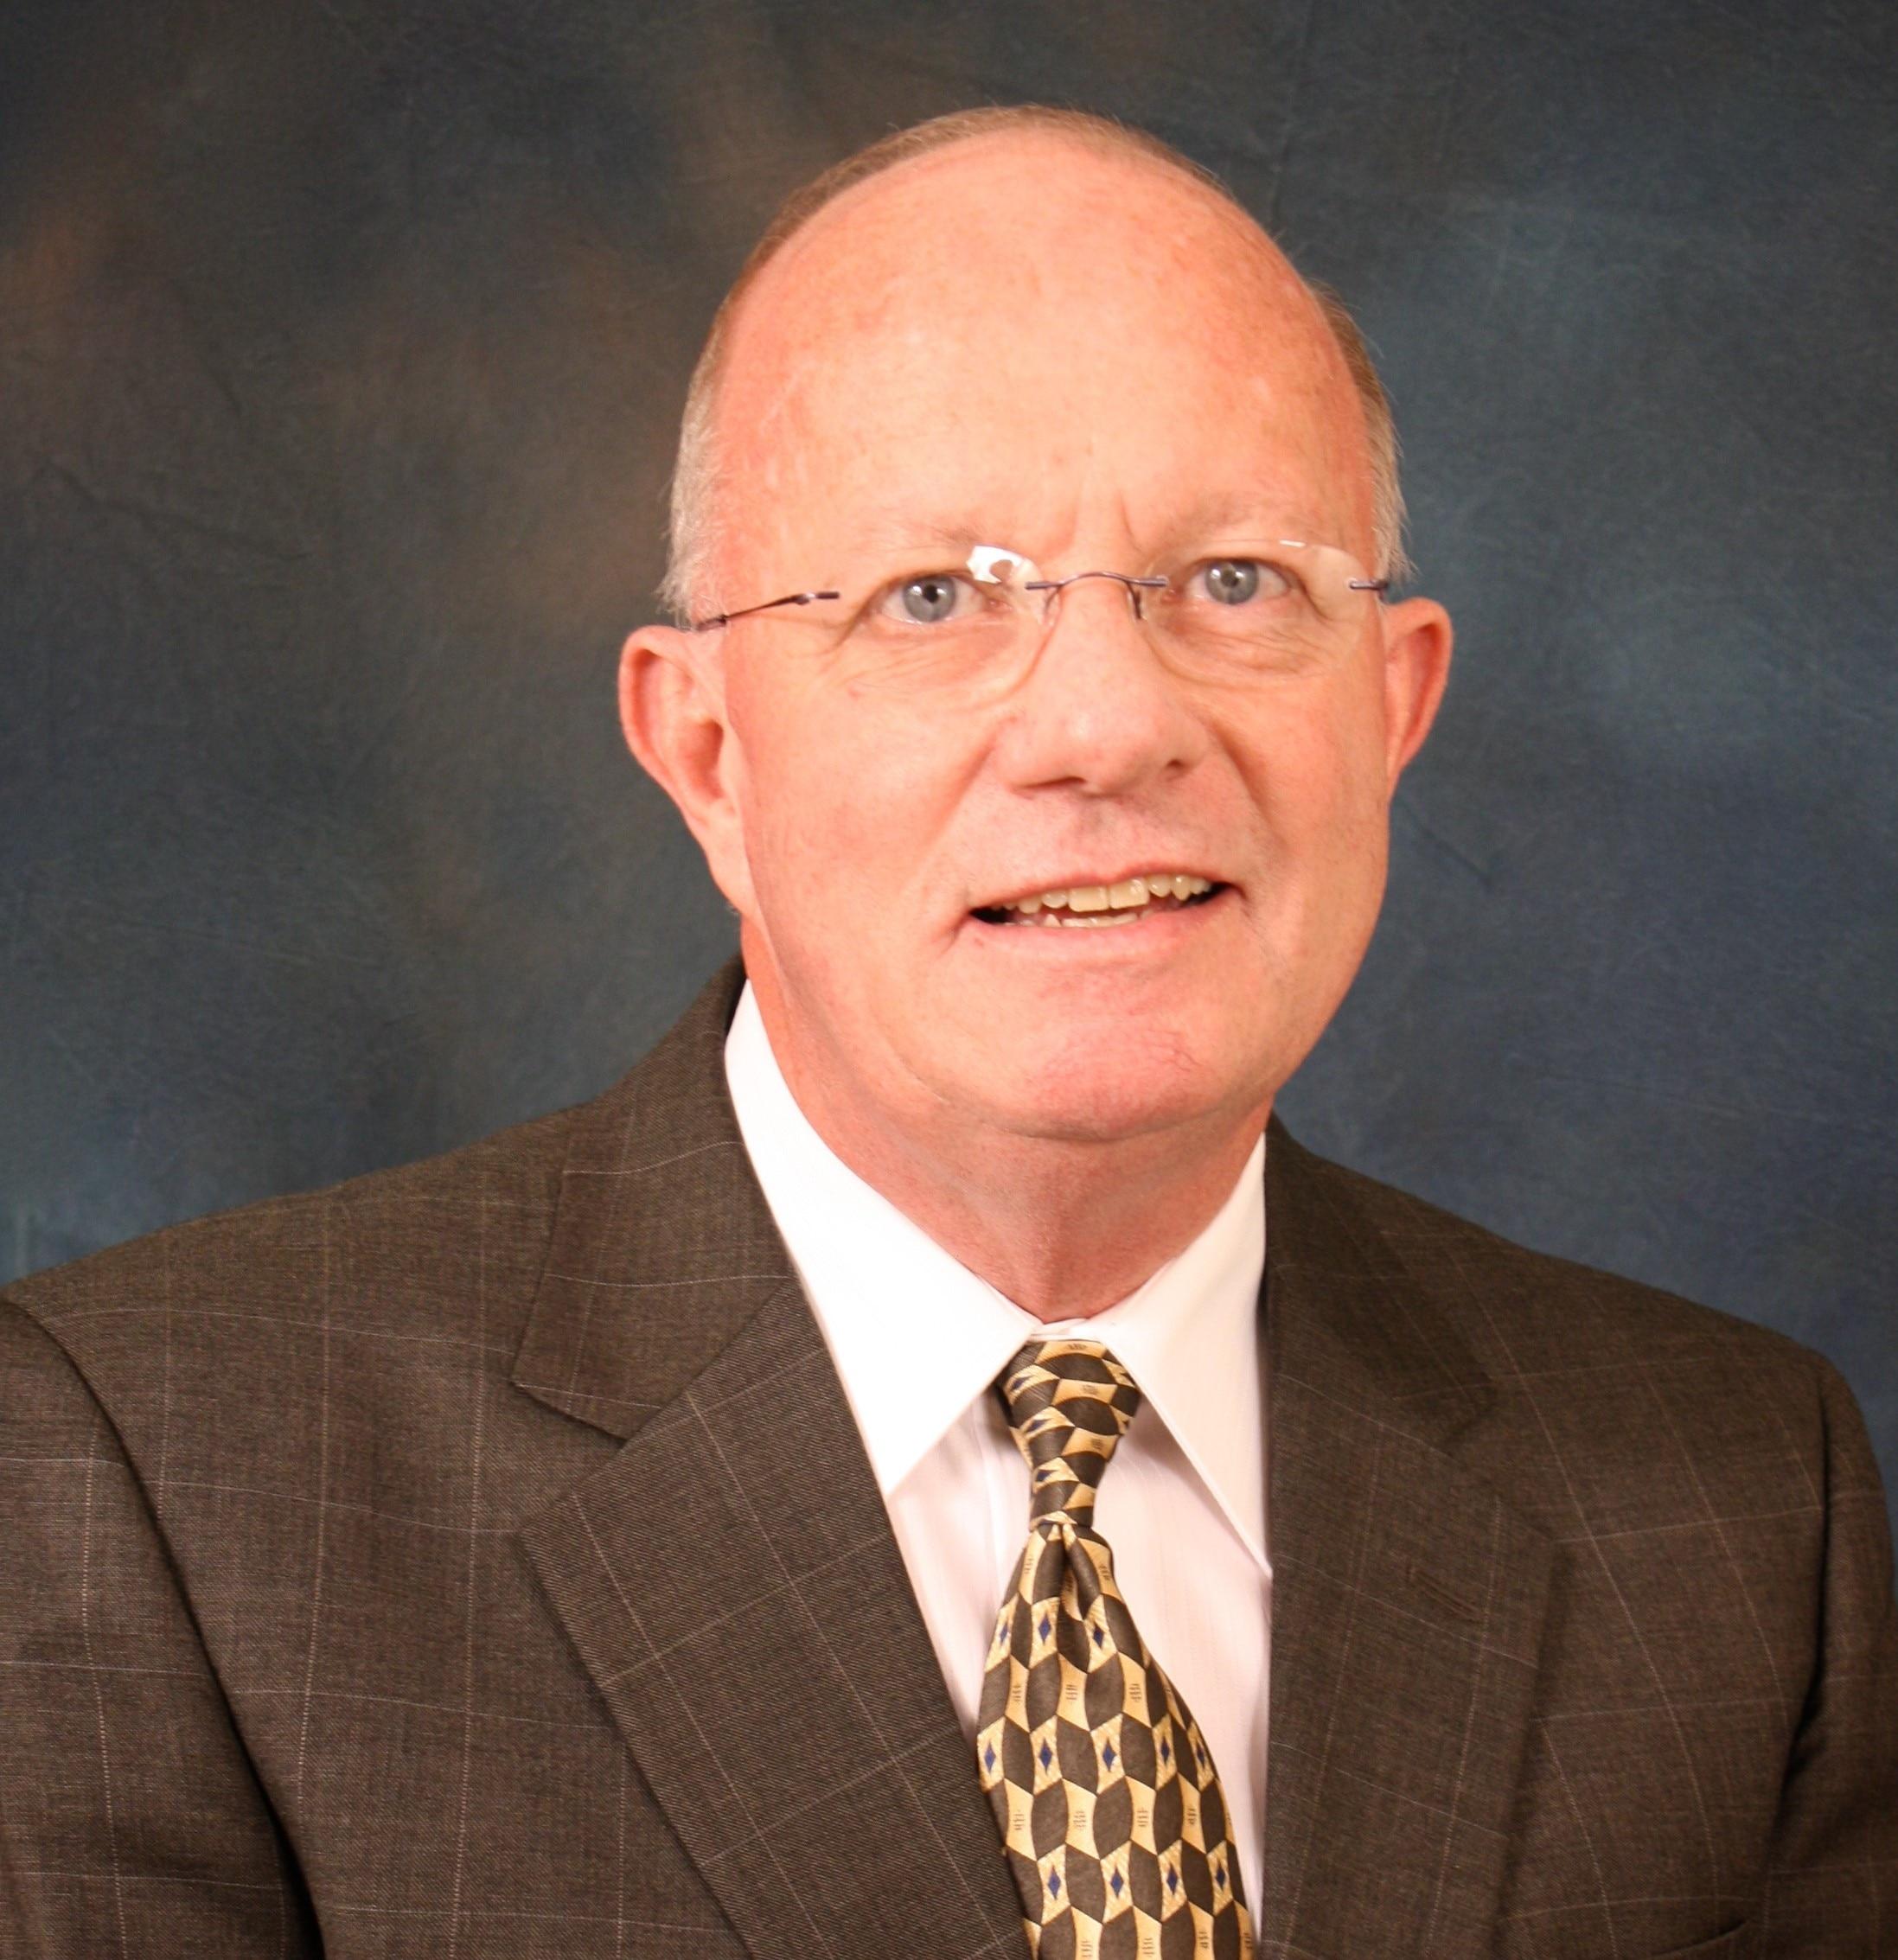 BRUCE W. BOWEN Financial Professional & Insurance Agent